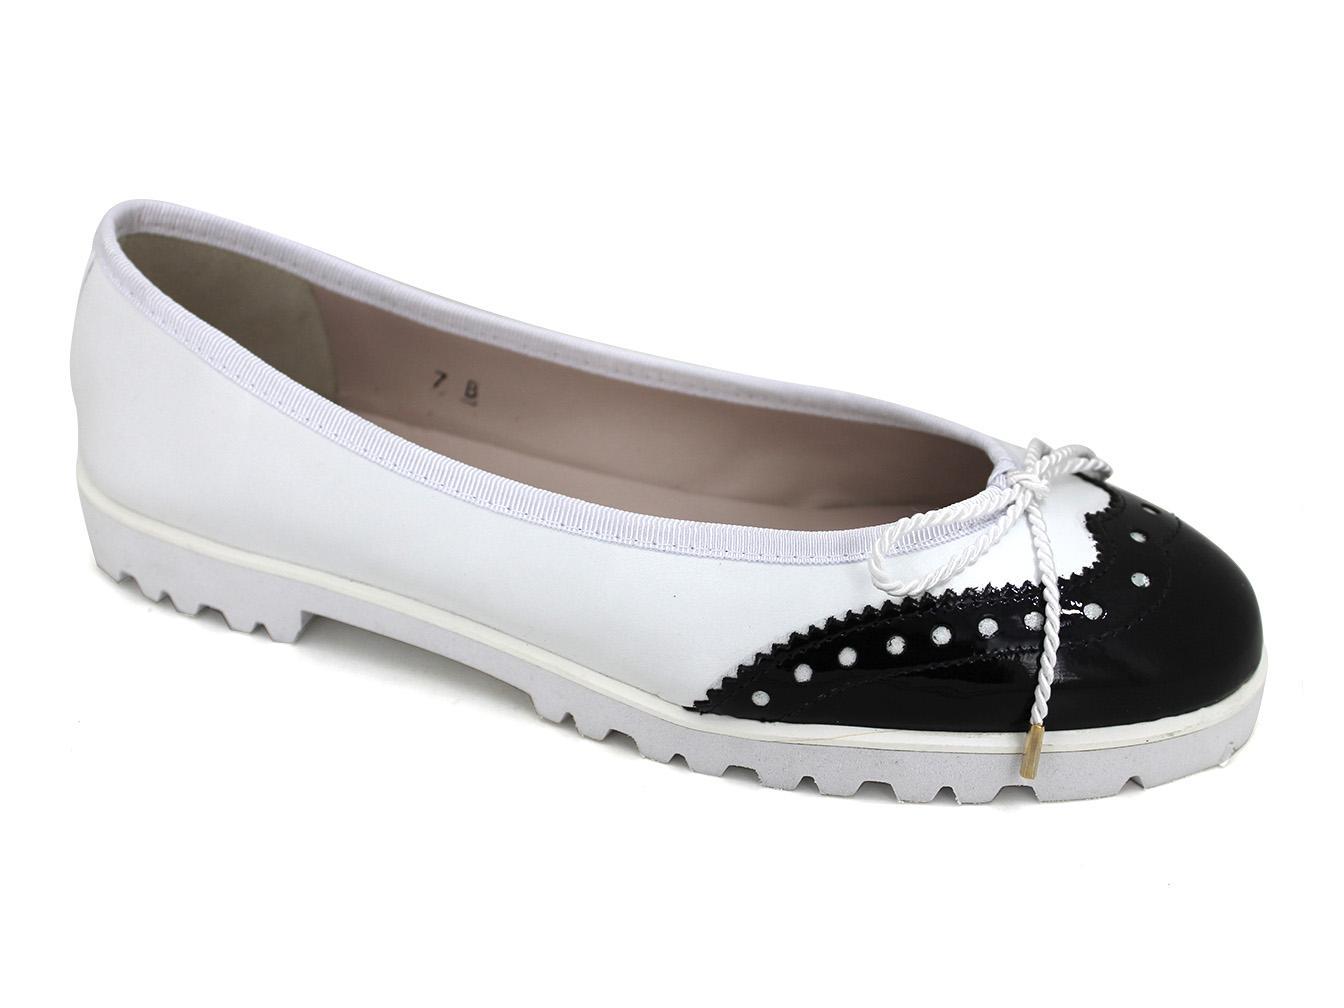 Paul Mayer : The Shoe Spa